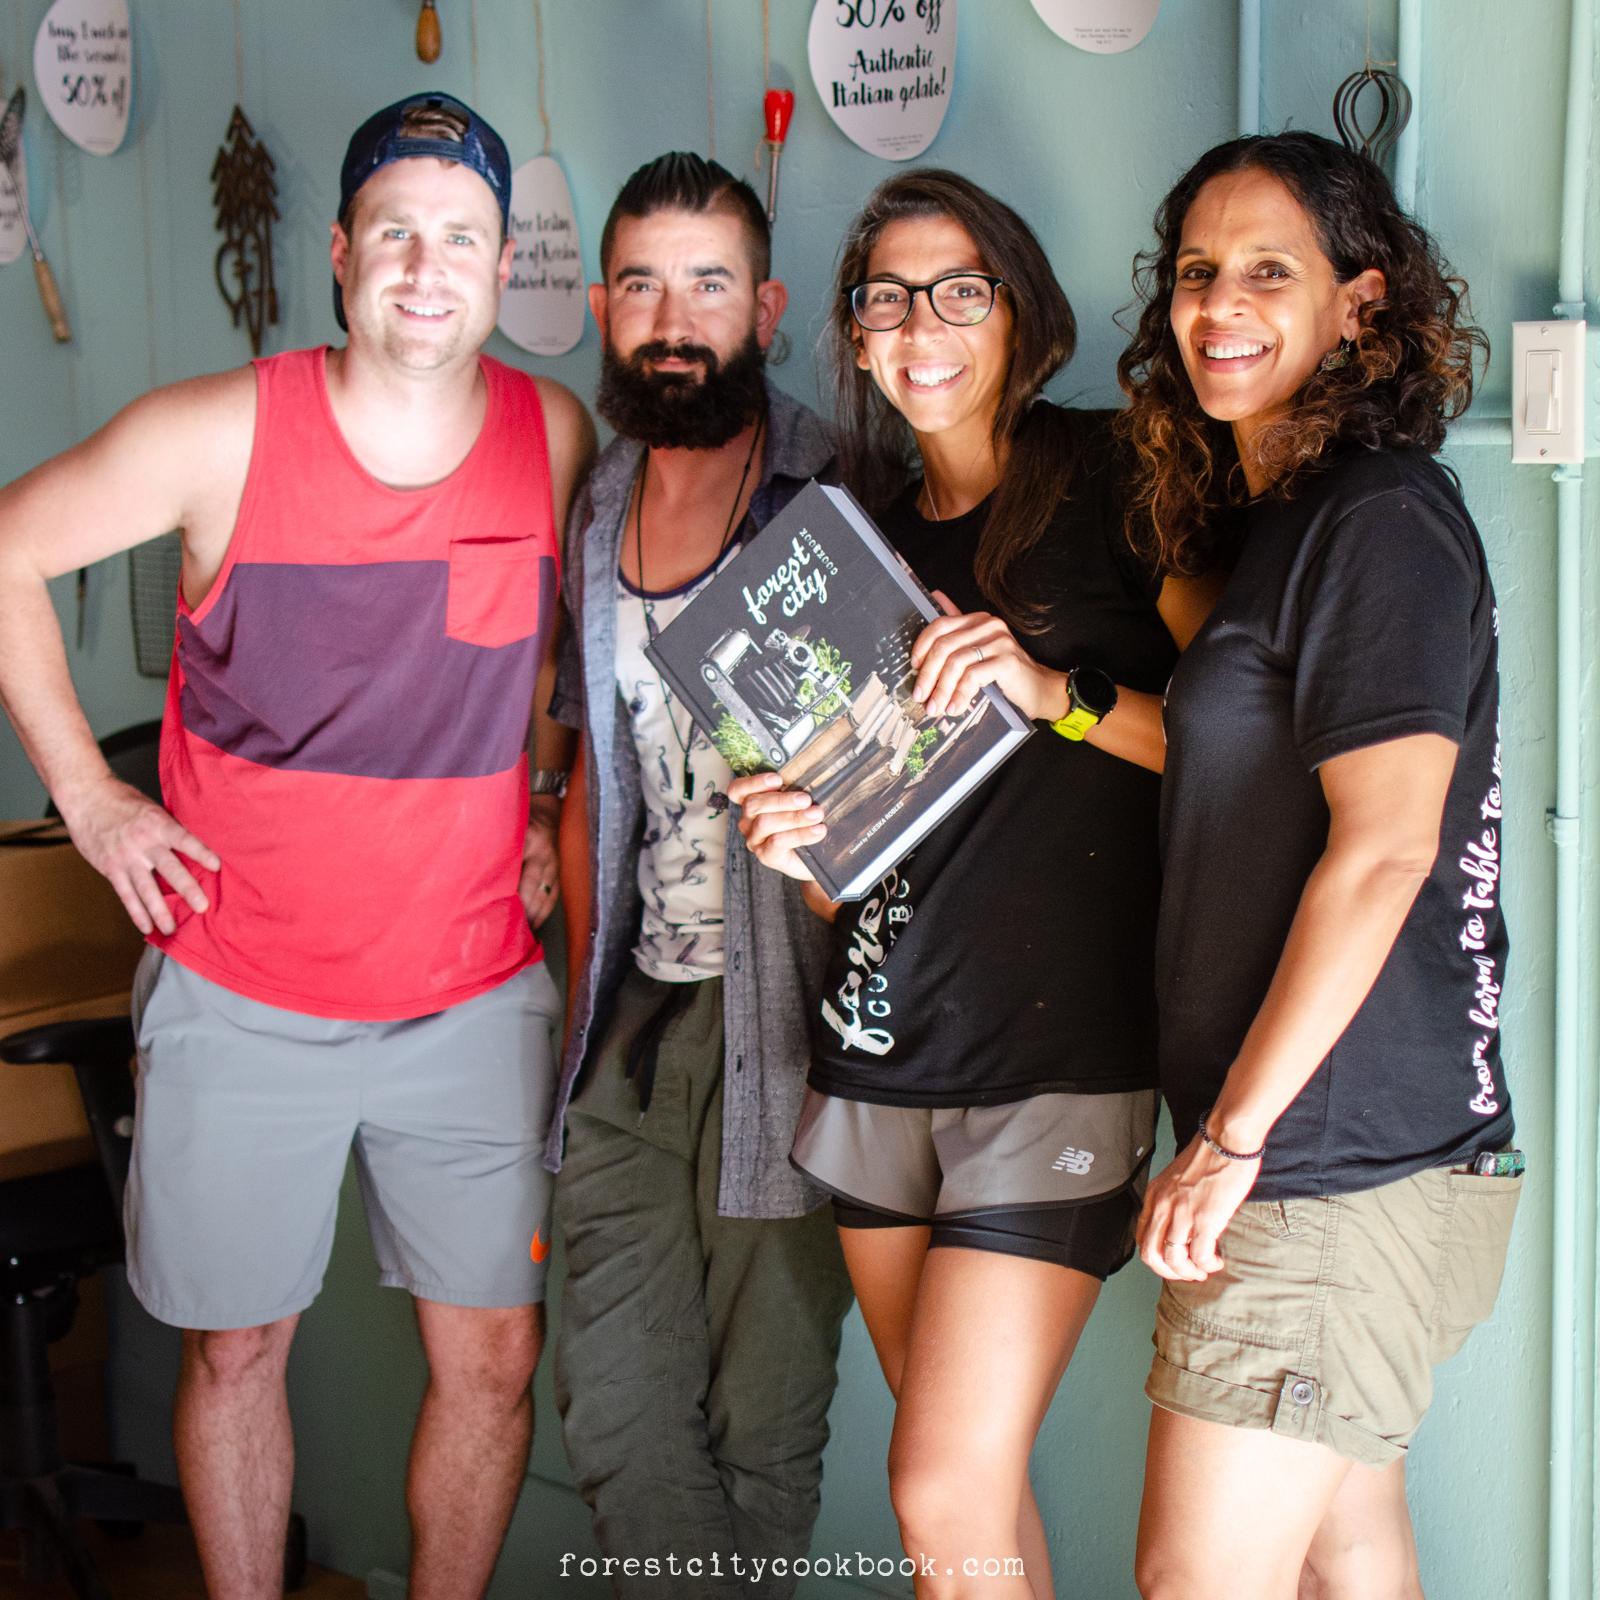 Forest City Cookbook - London Ontario-0331.jpg